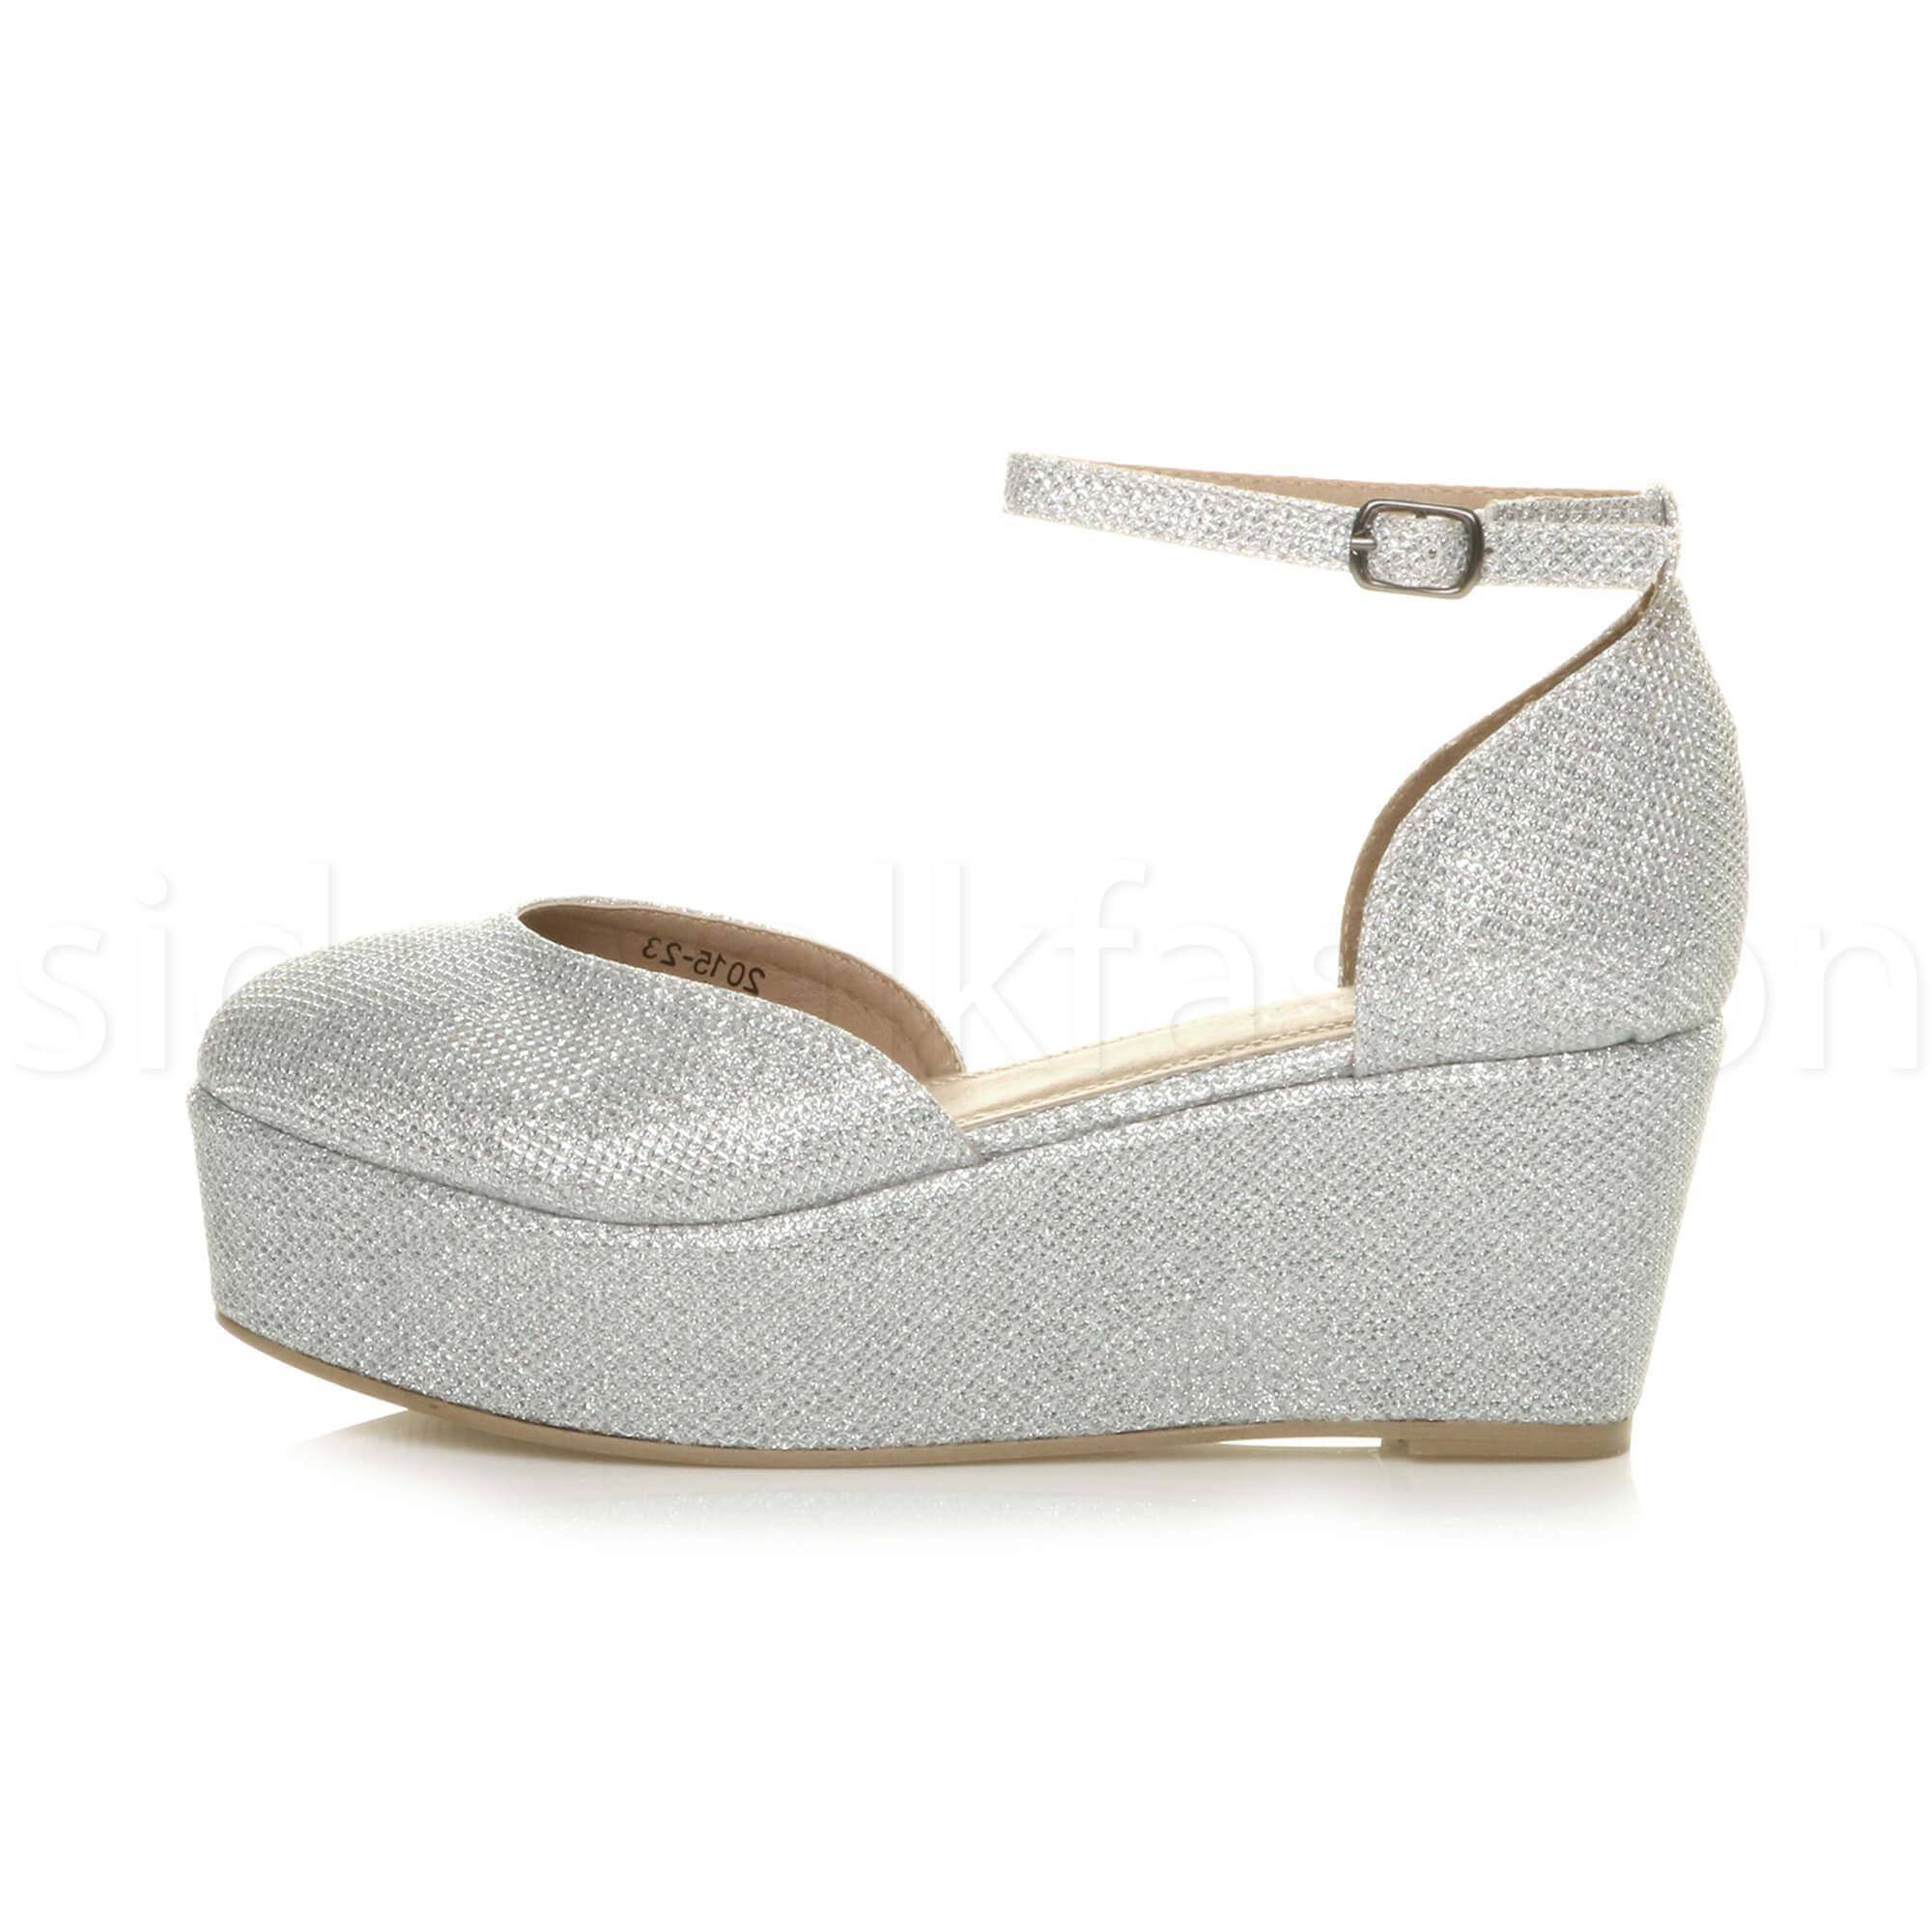 Womens-ladies-flatform-mid-wedge-ankle-strap-platform-court-shoes-sandals-size thumbnail 67